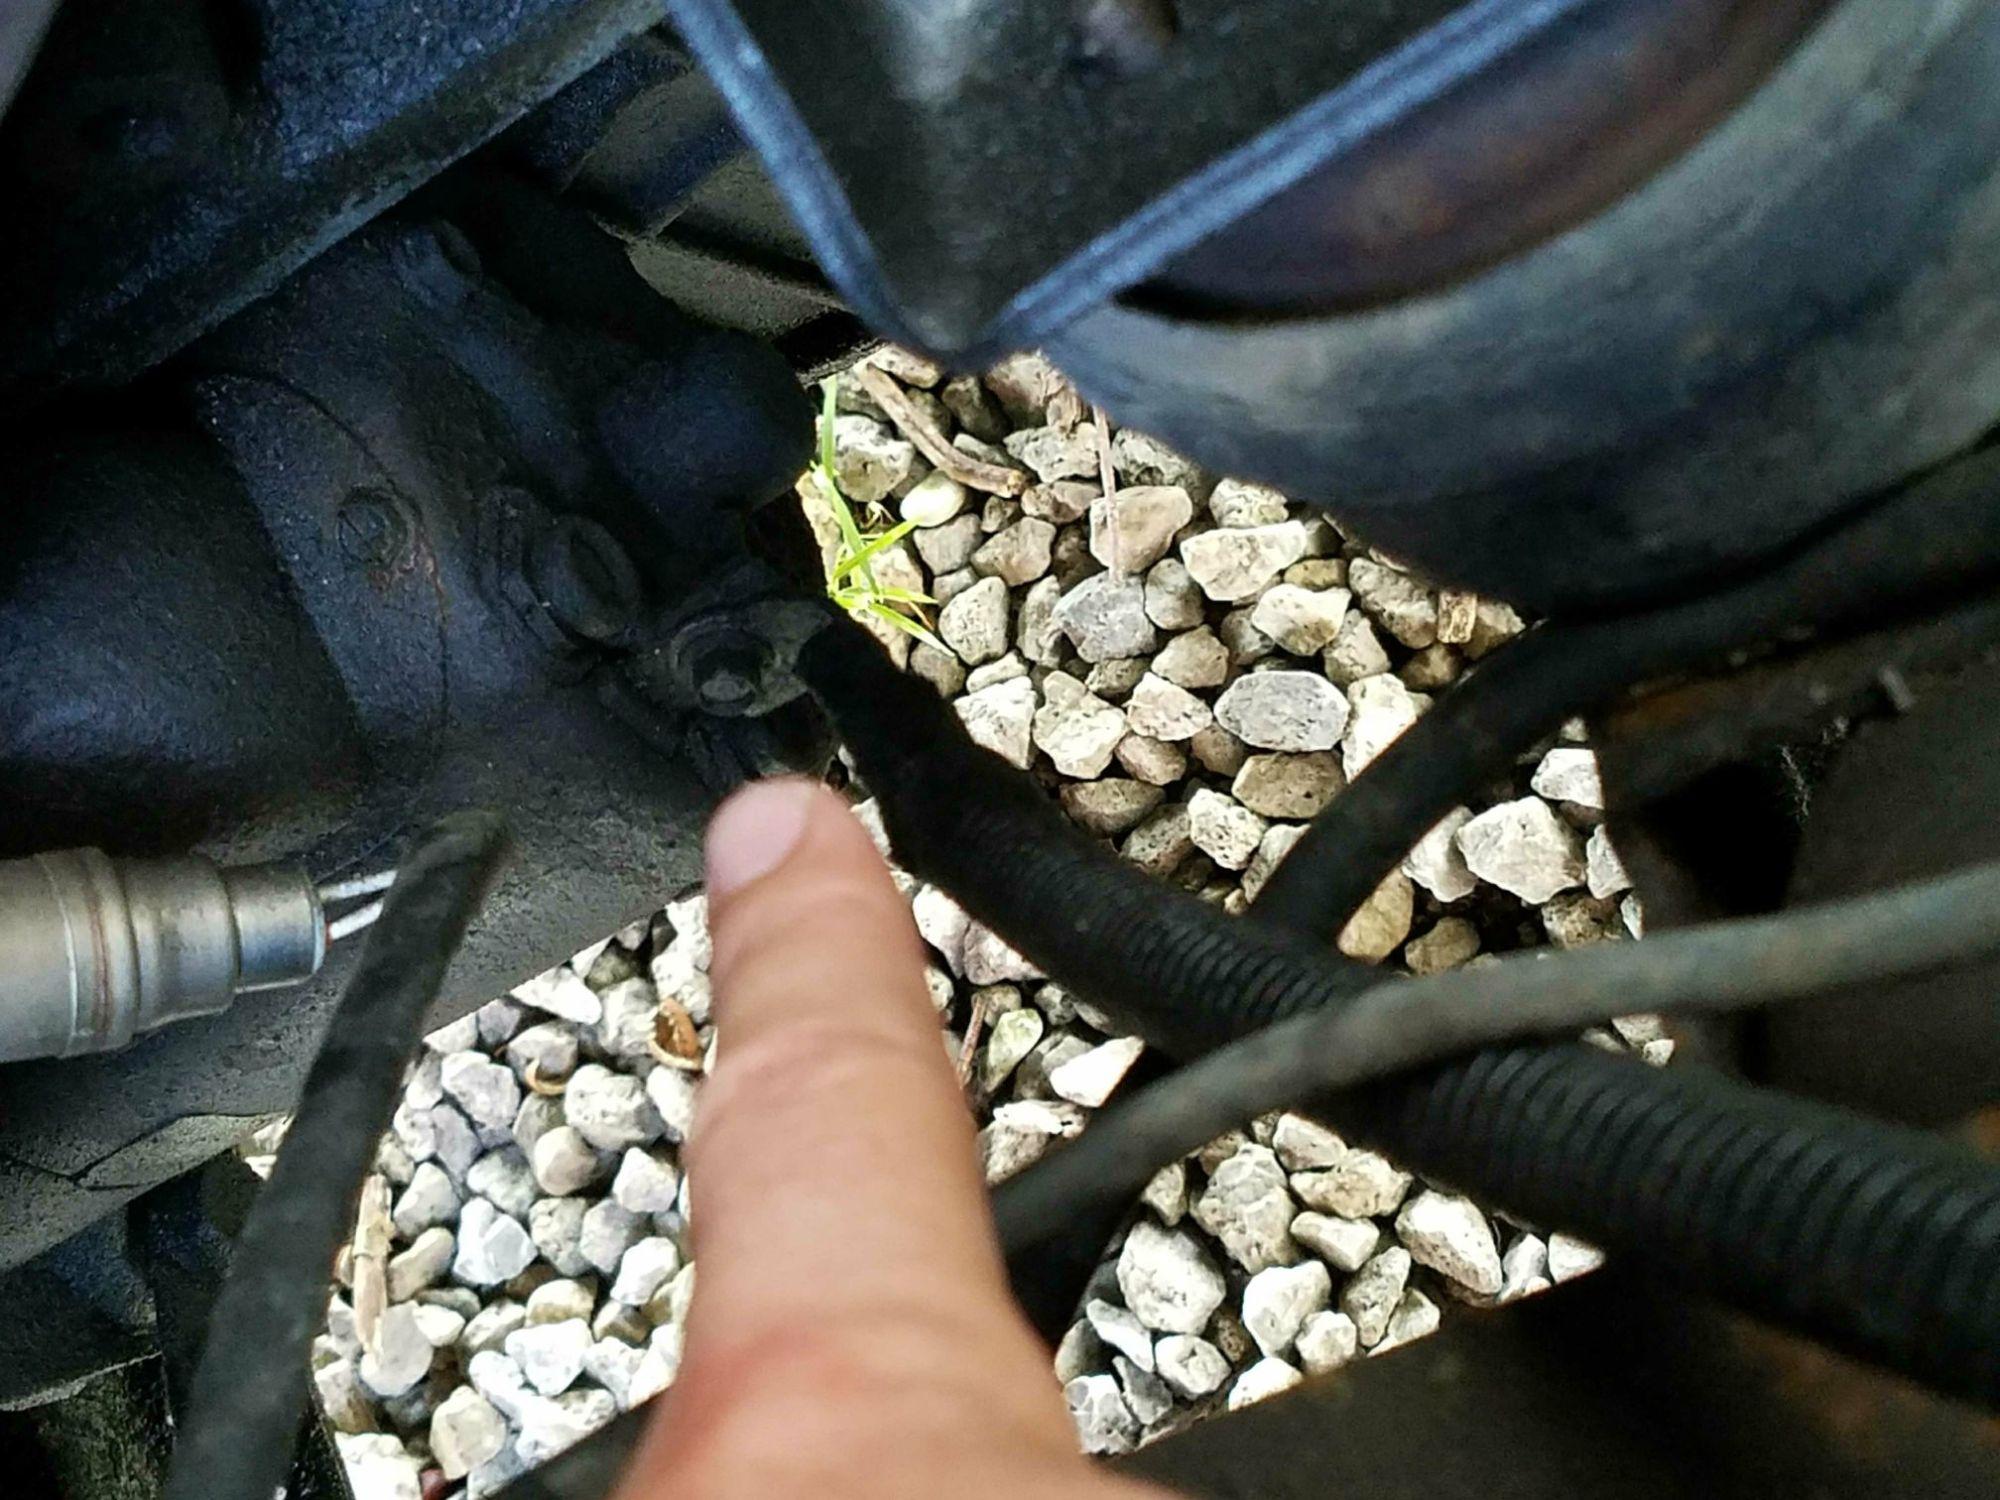 hight resolution of 1988 ford ranger starter solenoid wiring the ranger station 88 ford ranger starter solenoid wiring